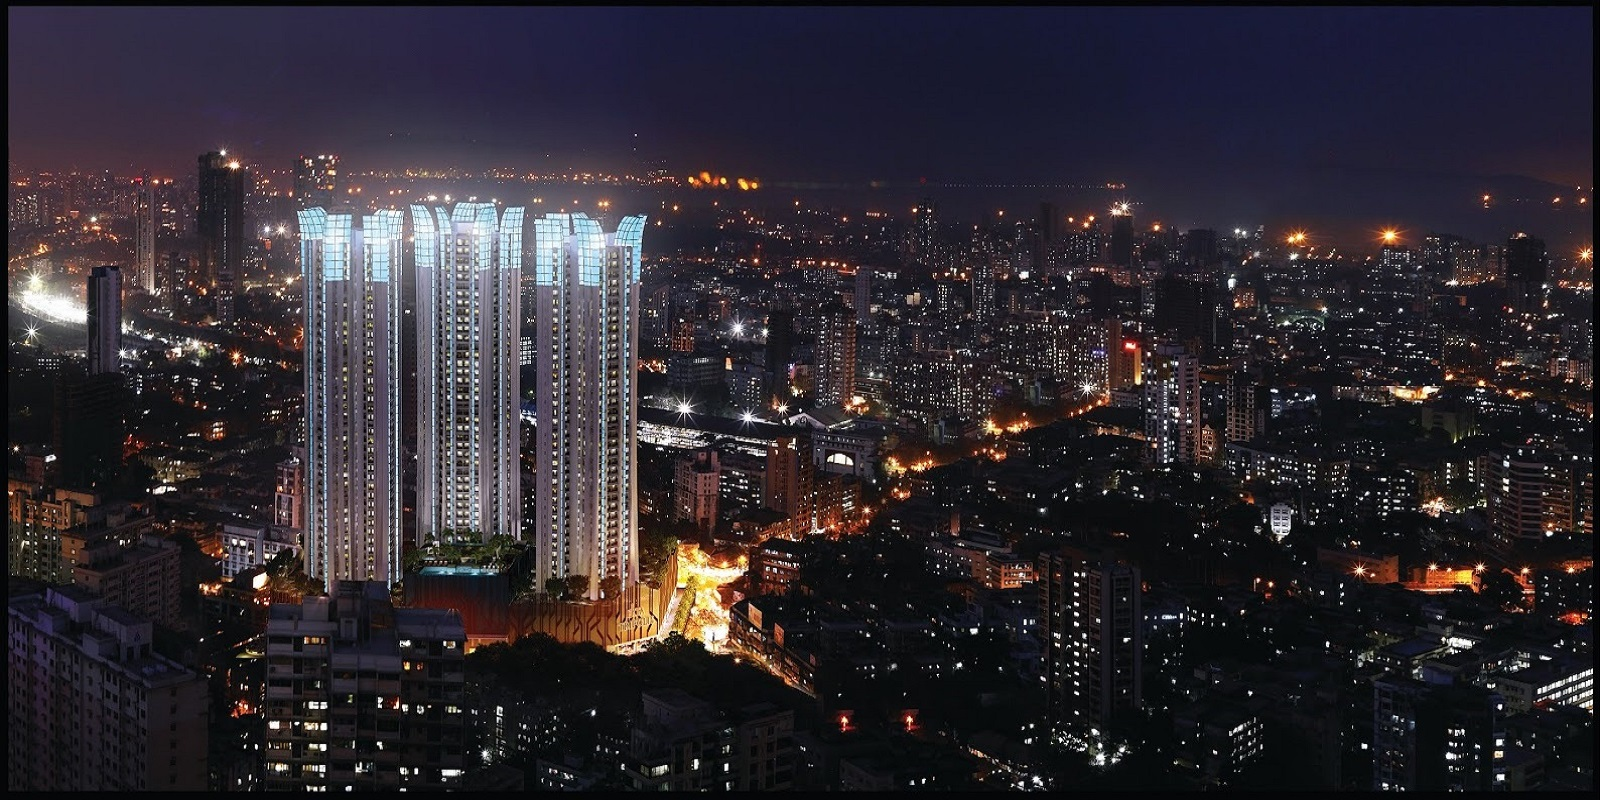 ekta world skypolis project large image1